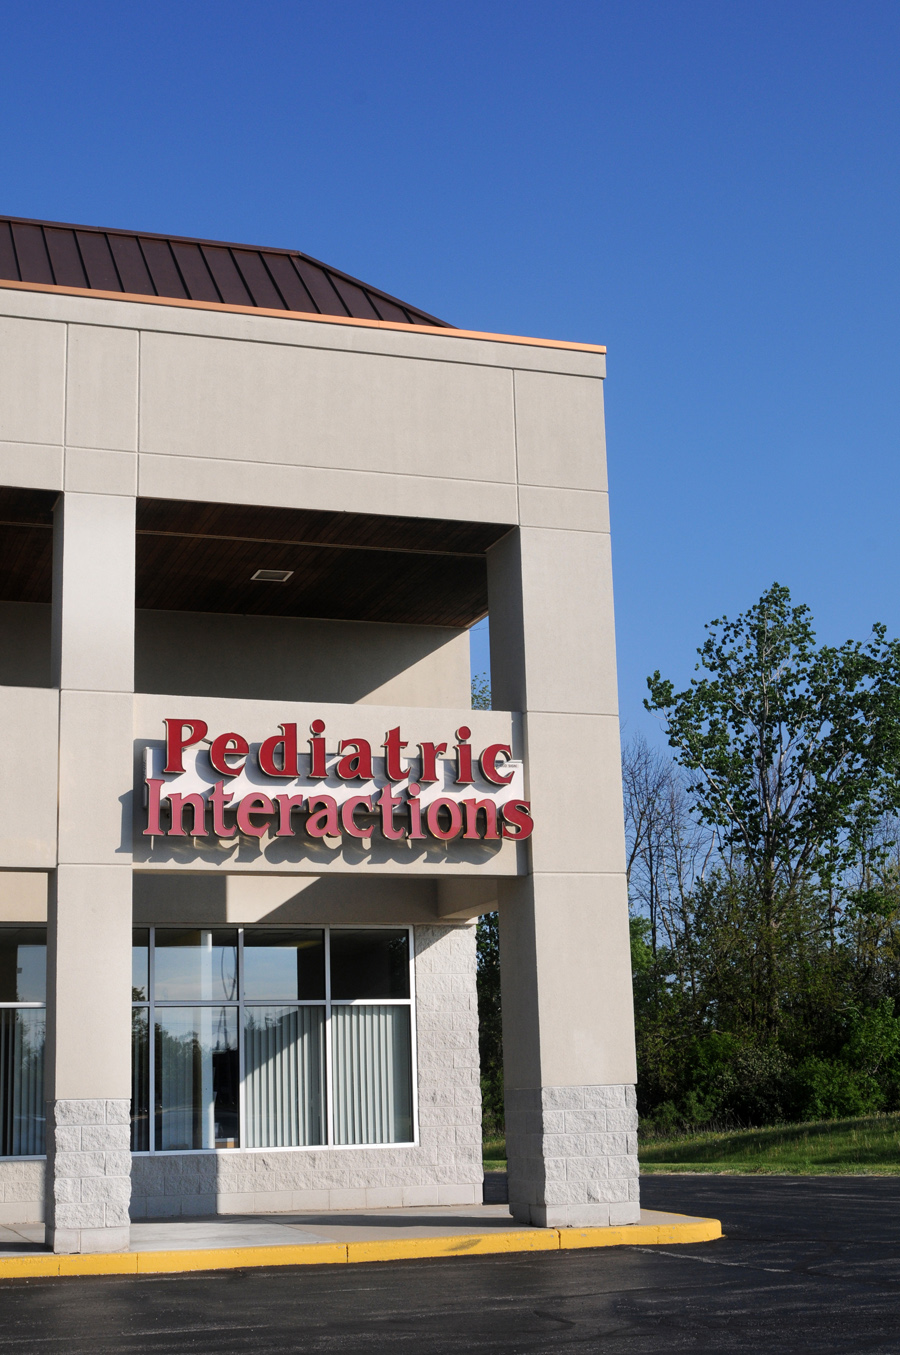 PediatricInteractions.JPG